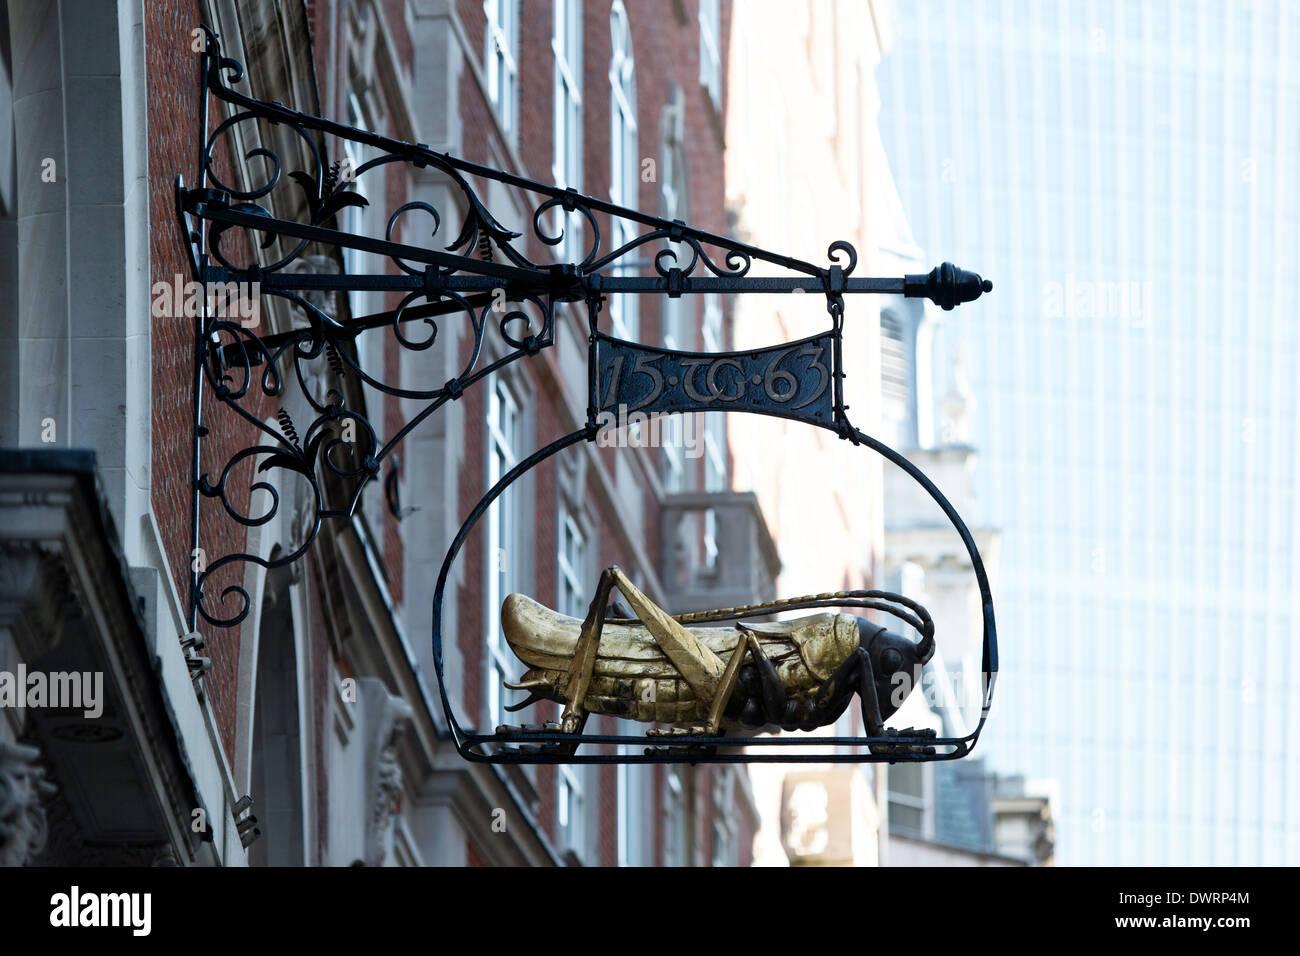 The Gresham grasshopper on Lombard Street, London, UK - Stock Image